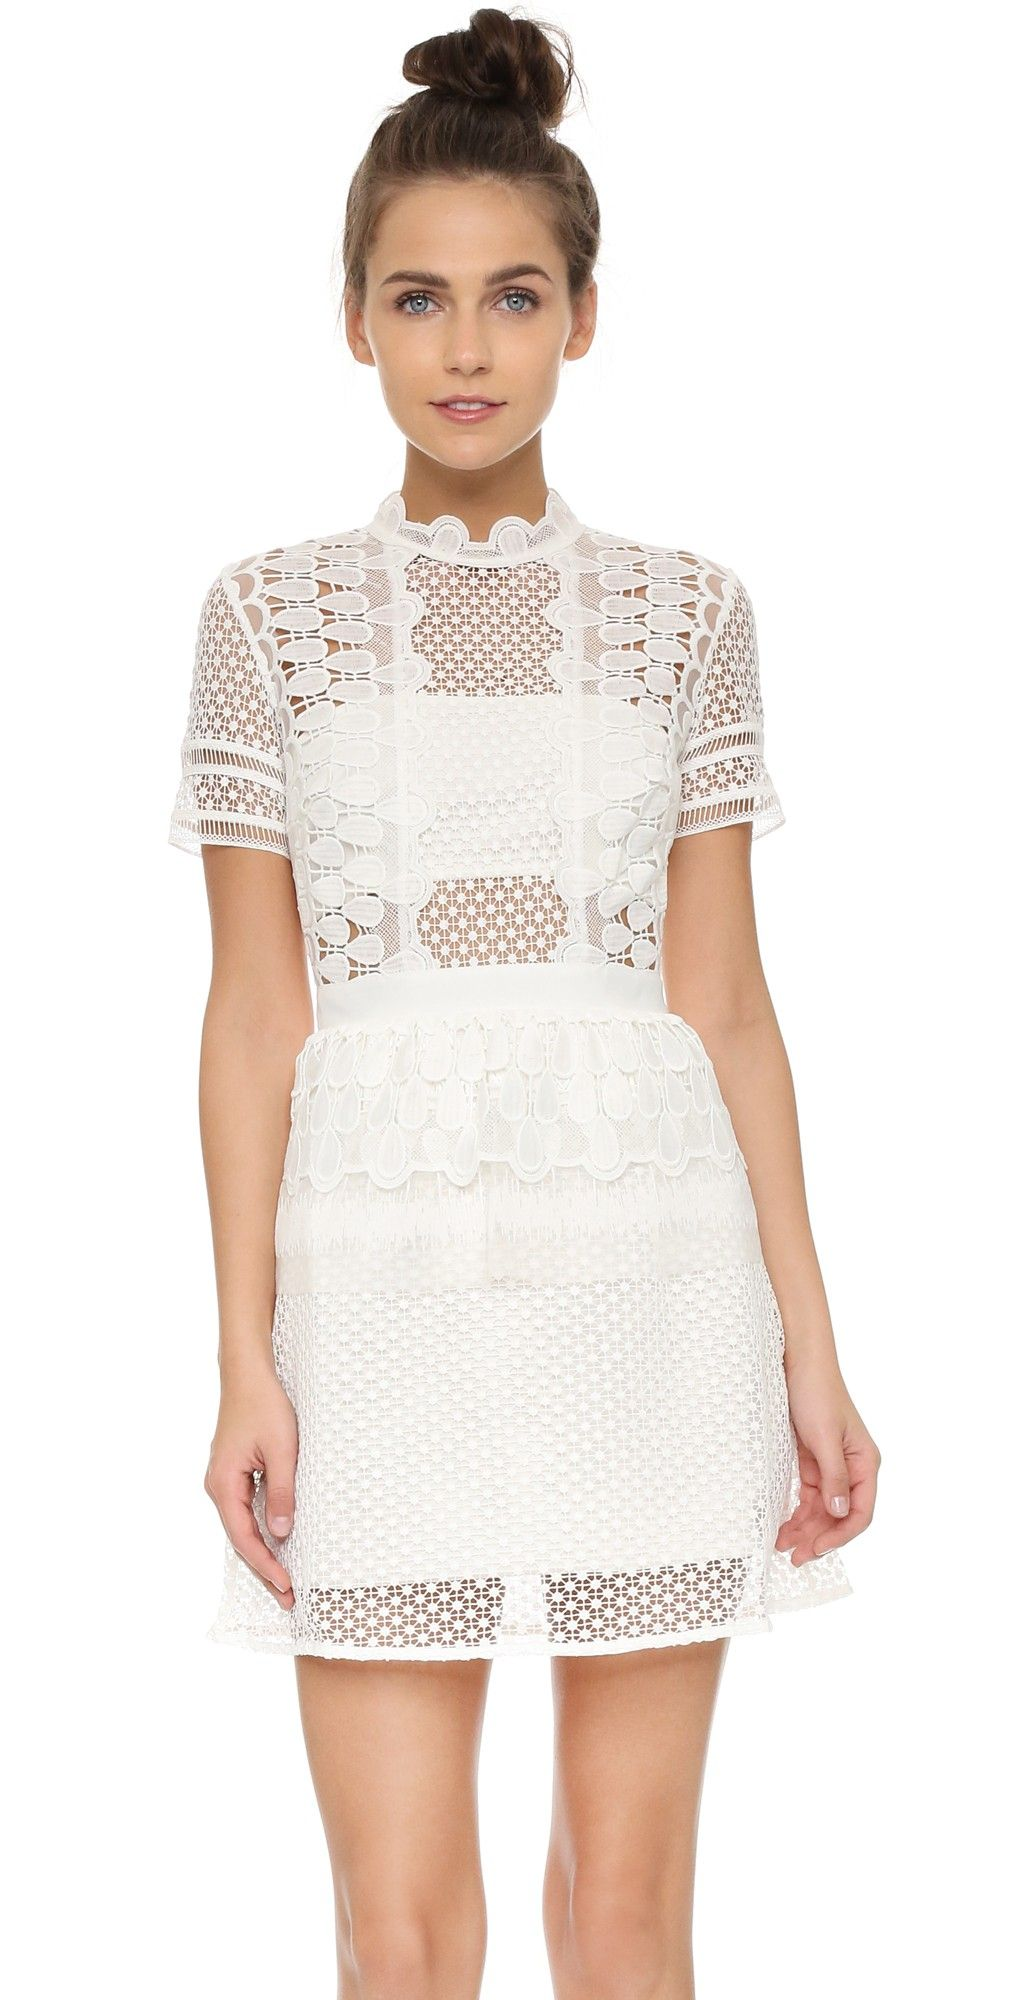 Self Portrait Sculpted Teardrop Dress Cocktail Dress Lace Mini Dress Off White Lace Dress [ 2000 x 1016 Pixel ]